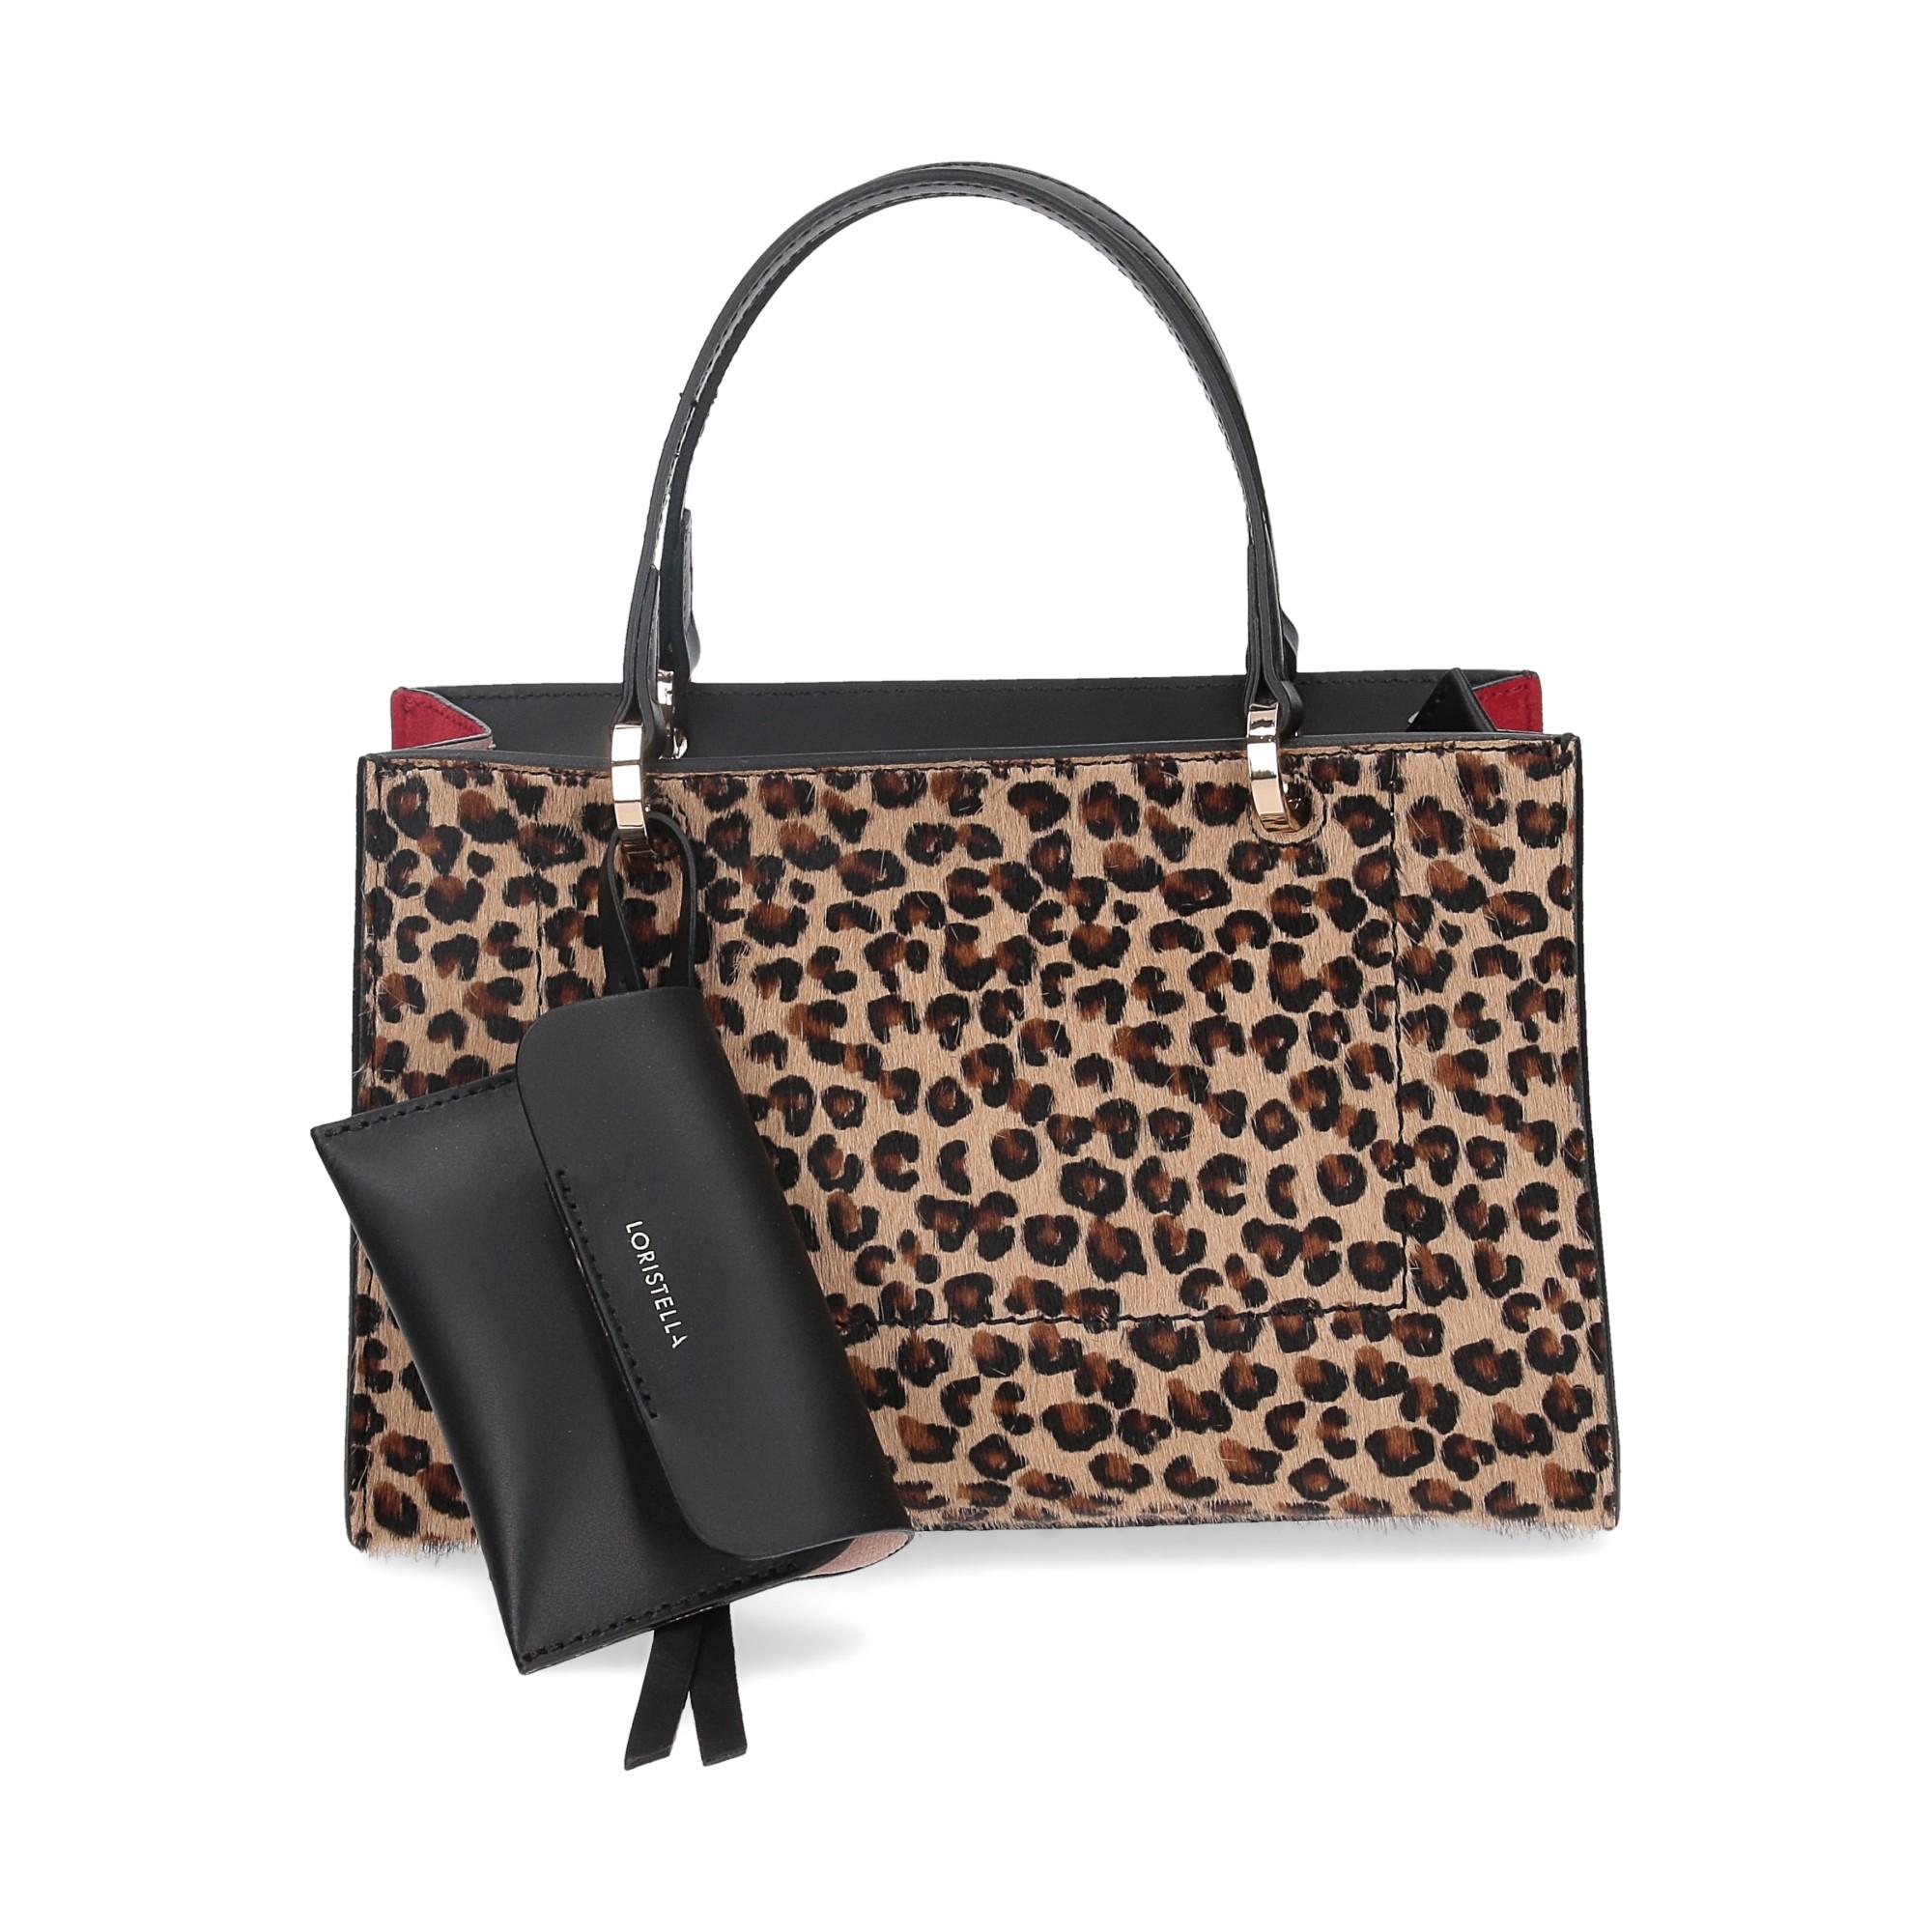 Loristella 2472C leopard